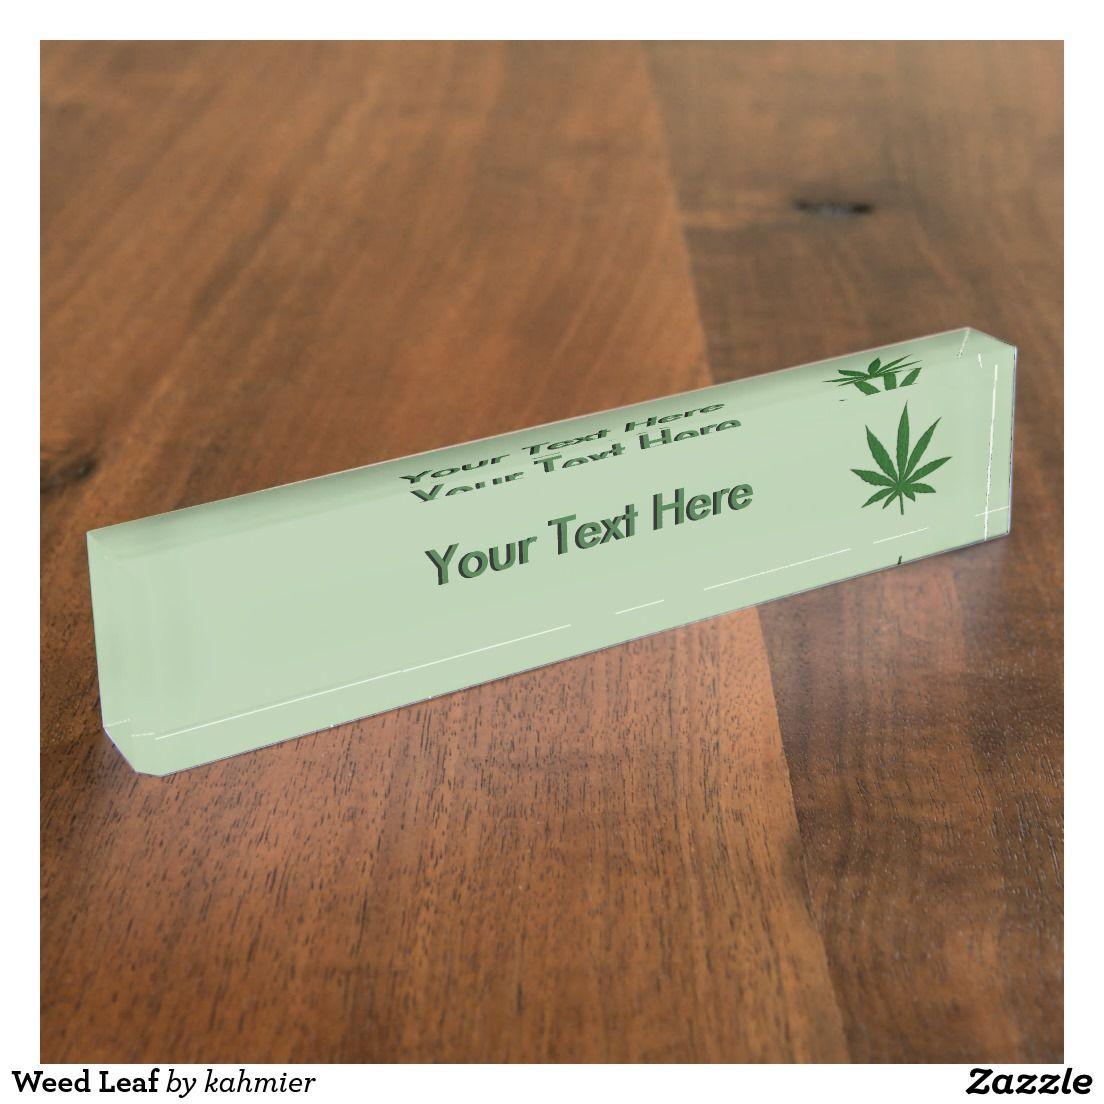 Weed Leaf Desk Name Plate #medicalmarijuana #ganja #marijuanabusiness